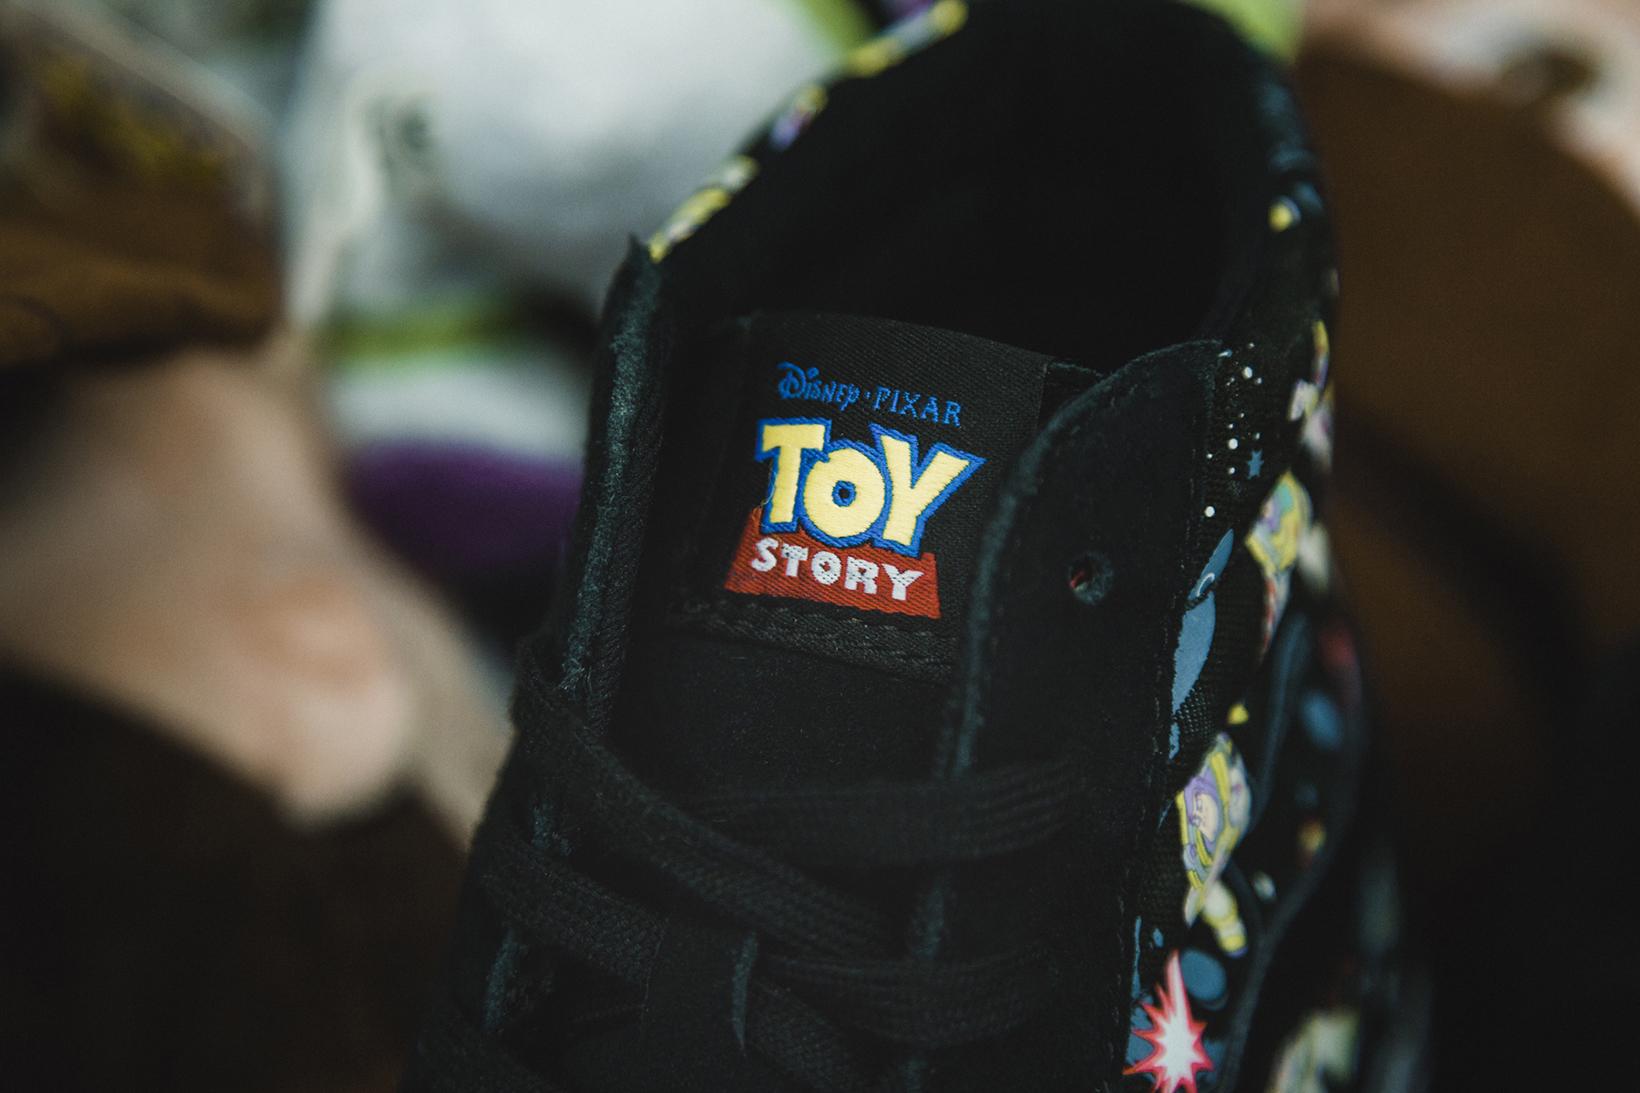 Toy Story Vans Sneakers Woody Buzz Lightyear Disney - 1765038